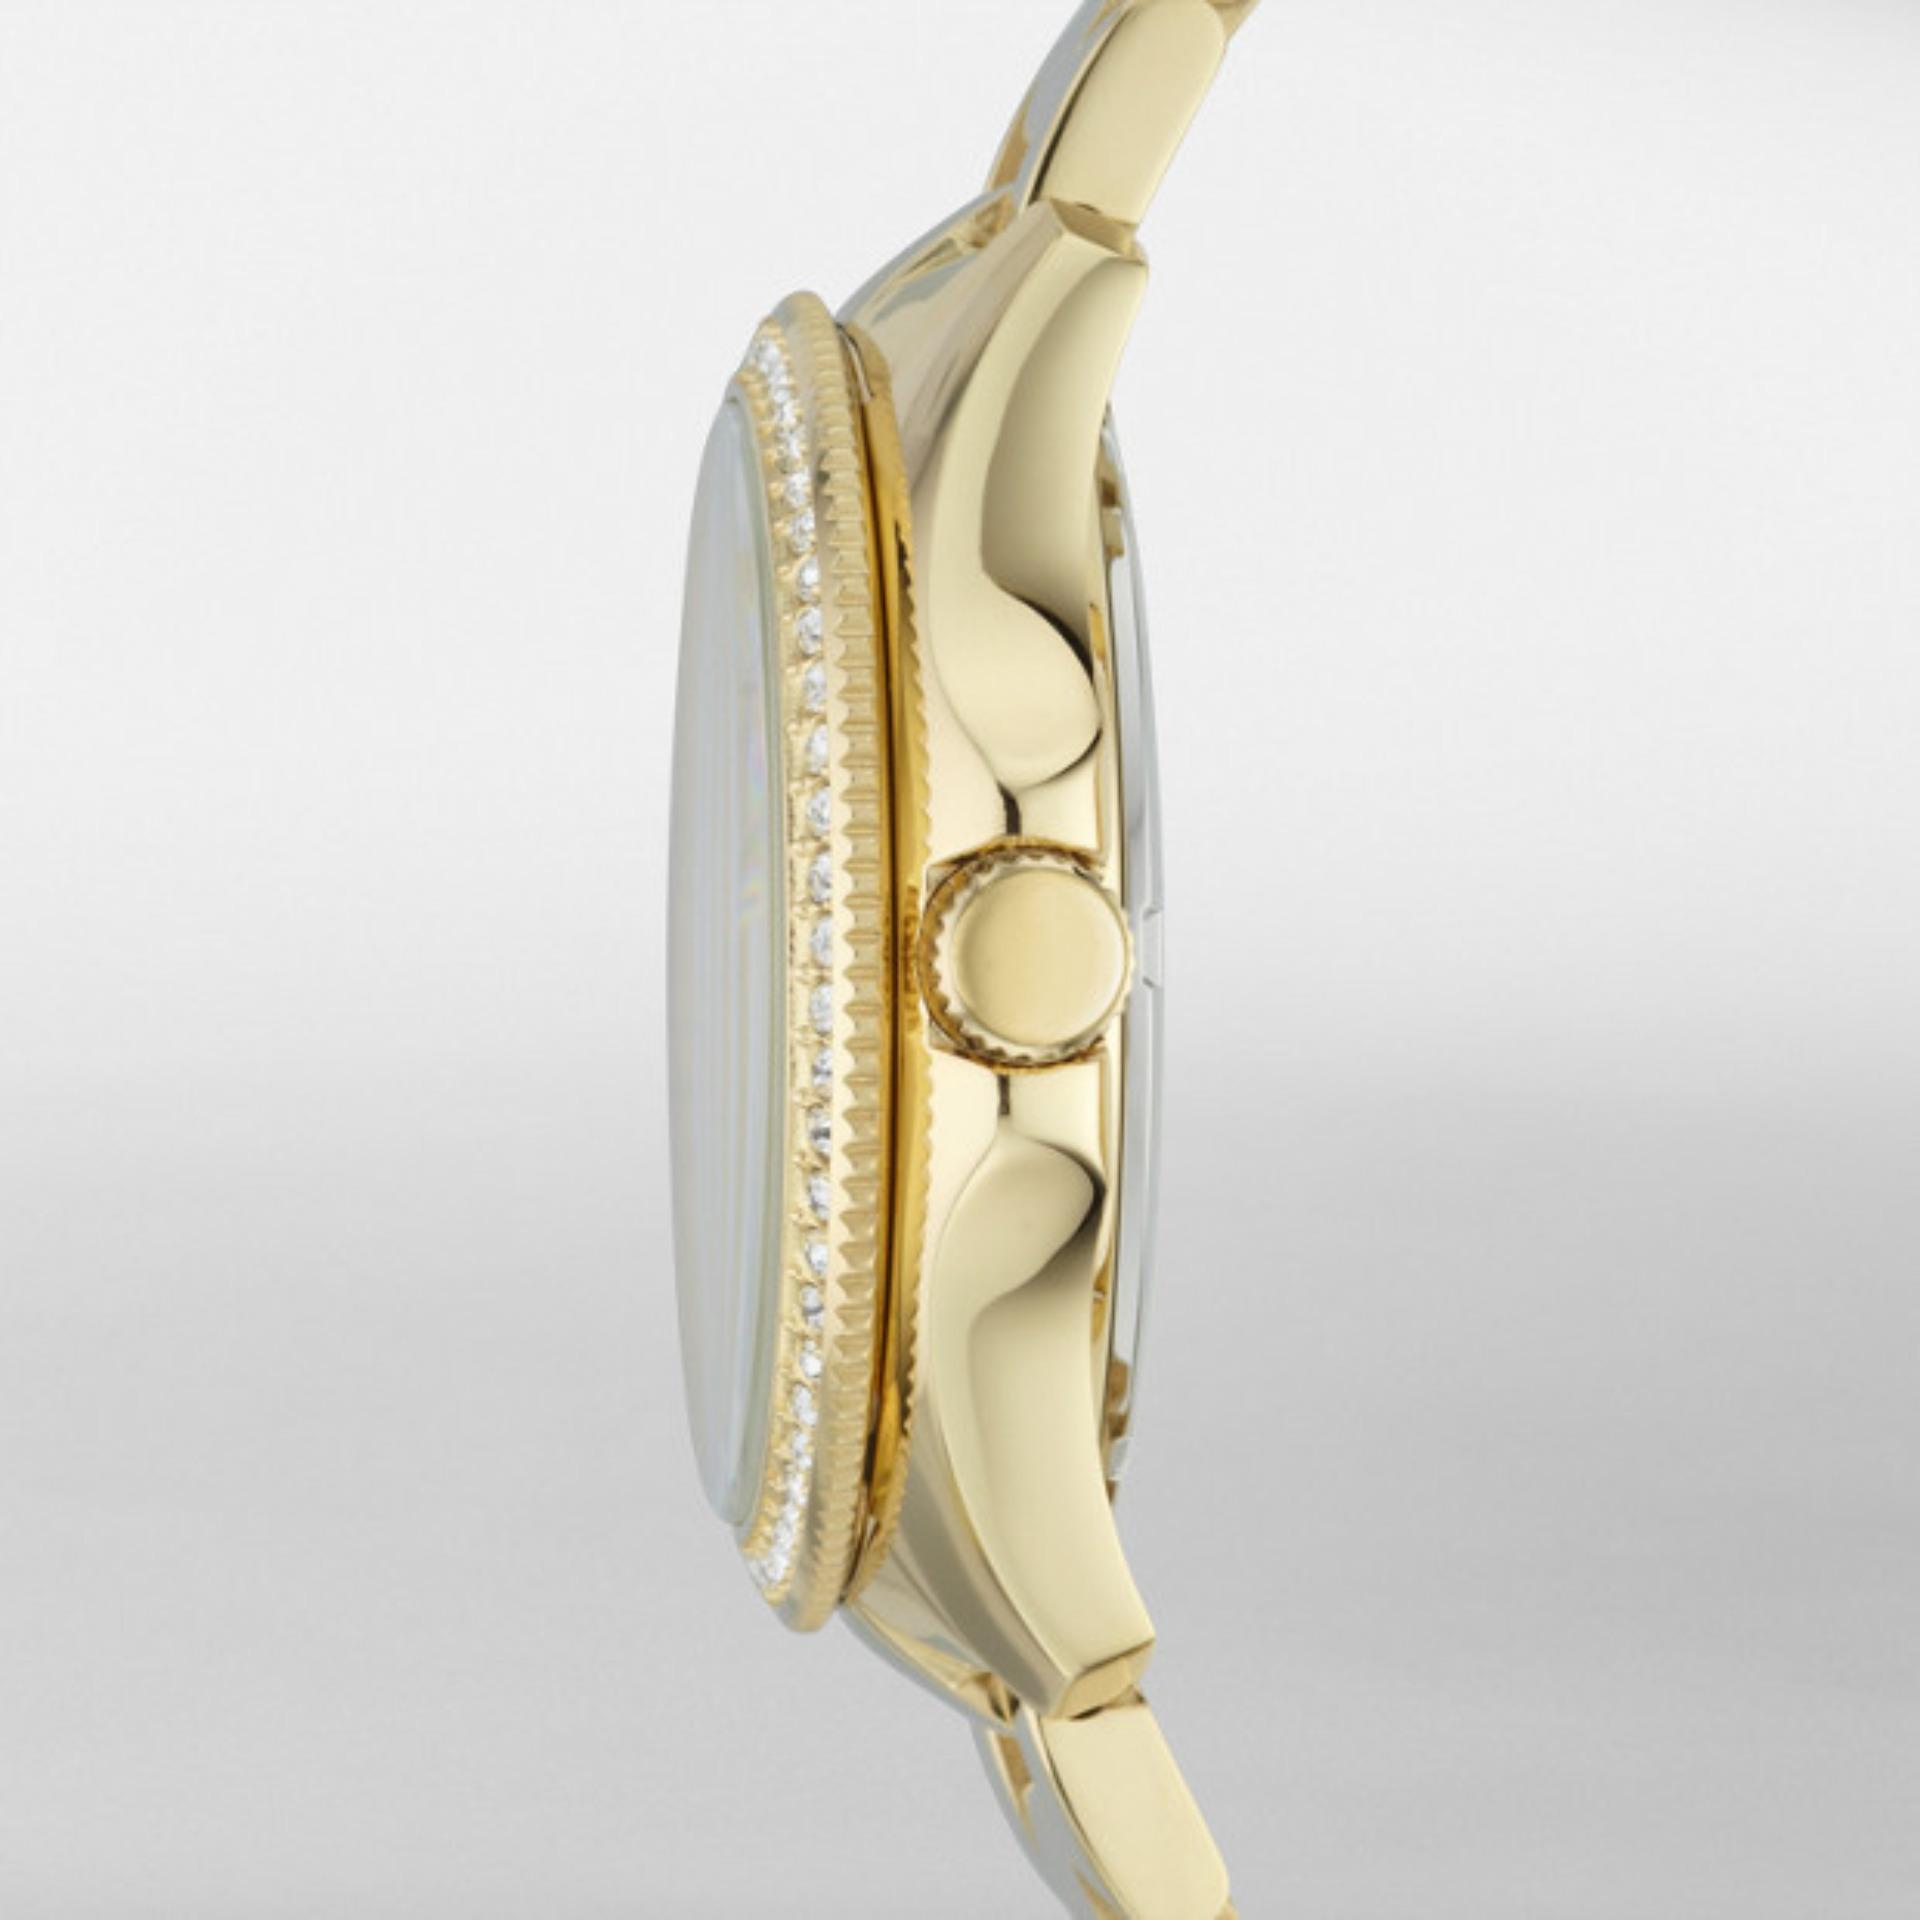 Fossil Cecile Jam Tangan Wanita Putih Kombinasi Rosegold Tali Kulit Original Am4482 Multifunction Gold